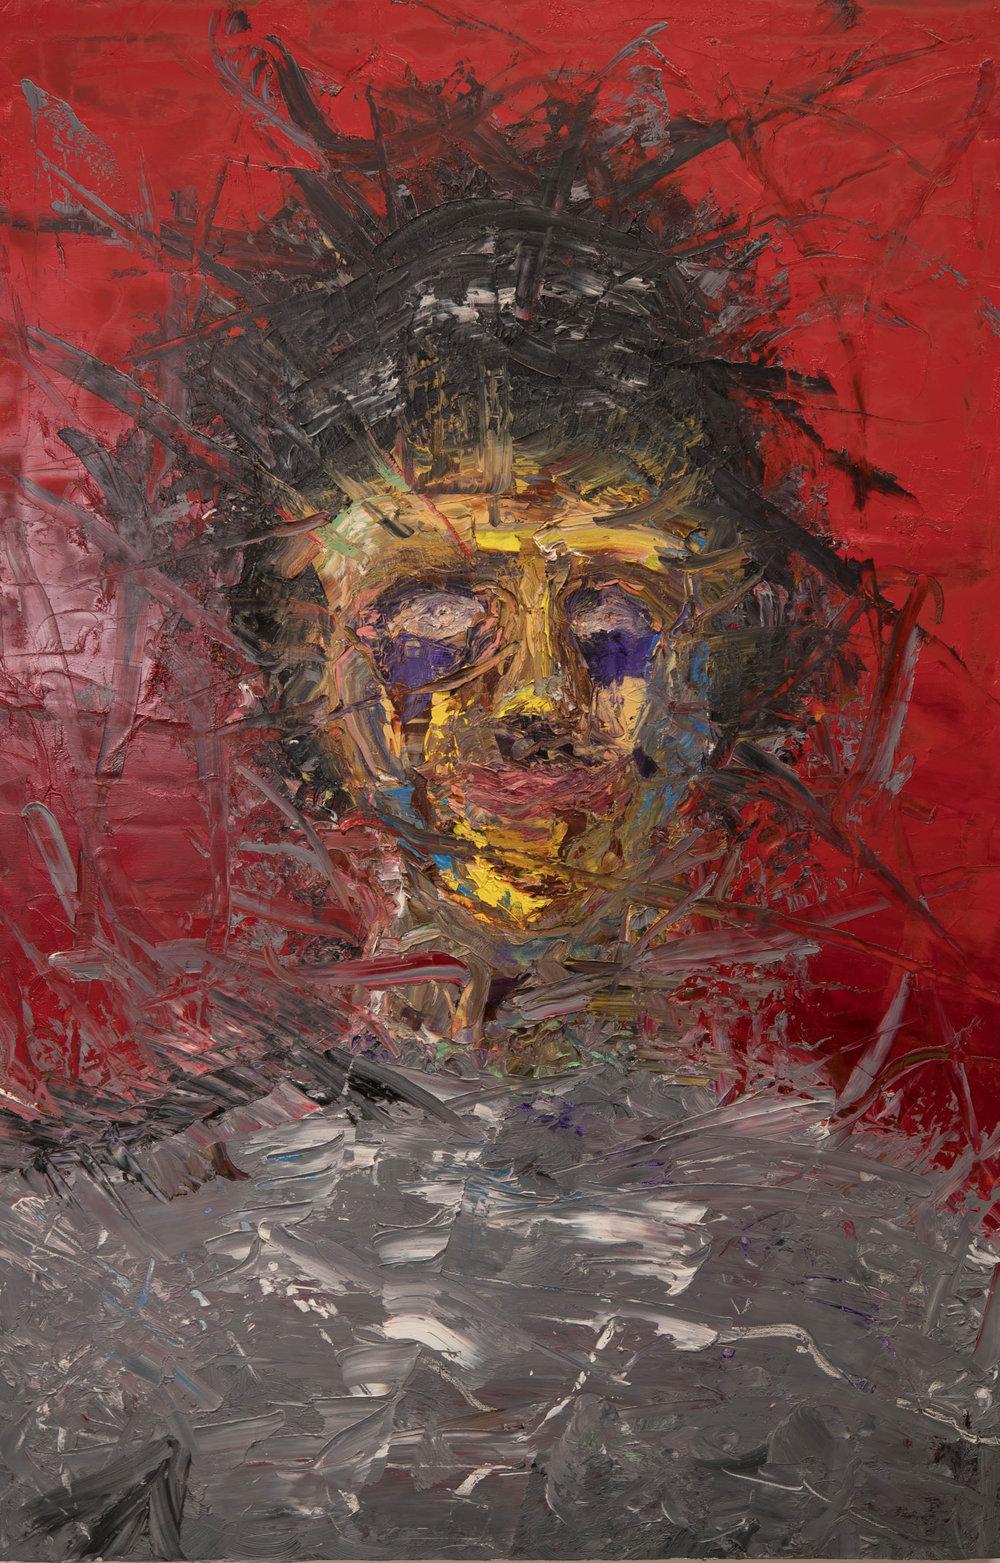 "Self Portrait,Oil on Canvas, 42"" x 24"", 2016"